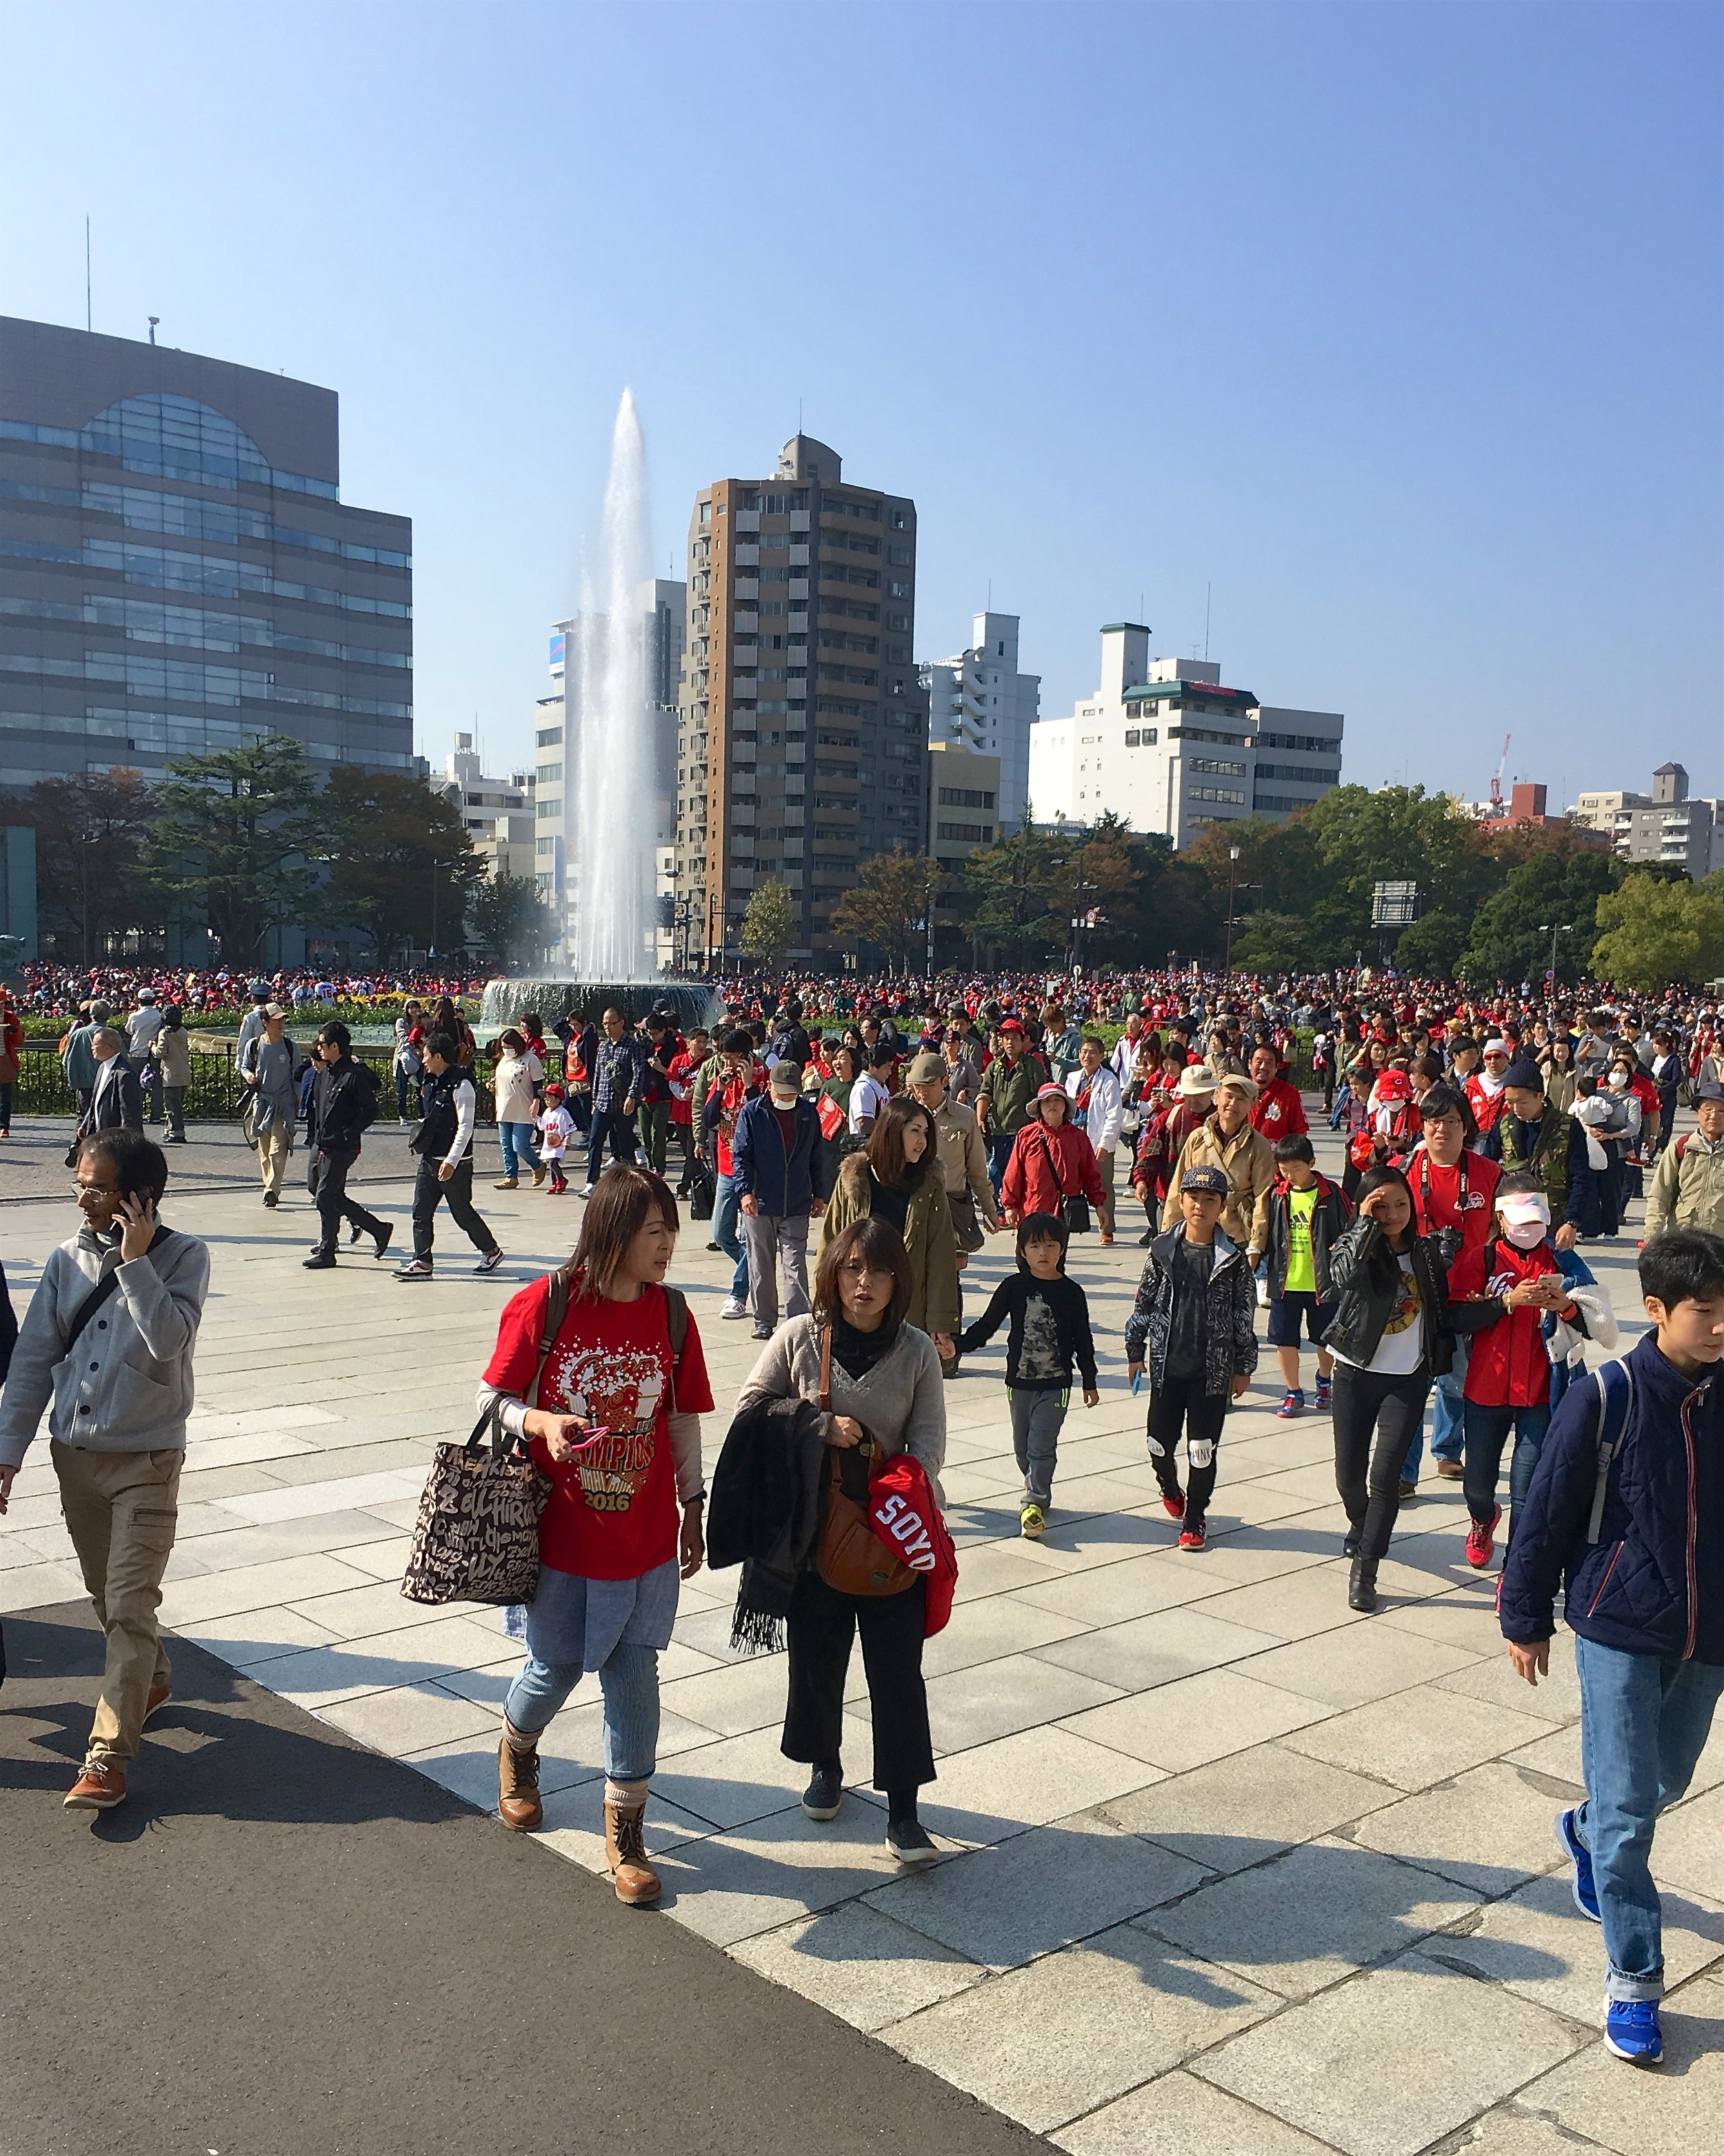 Hiroshima Carp fans